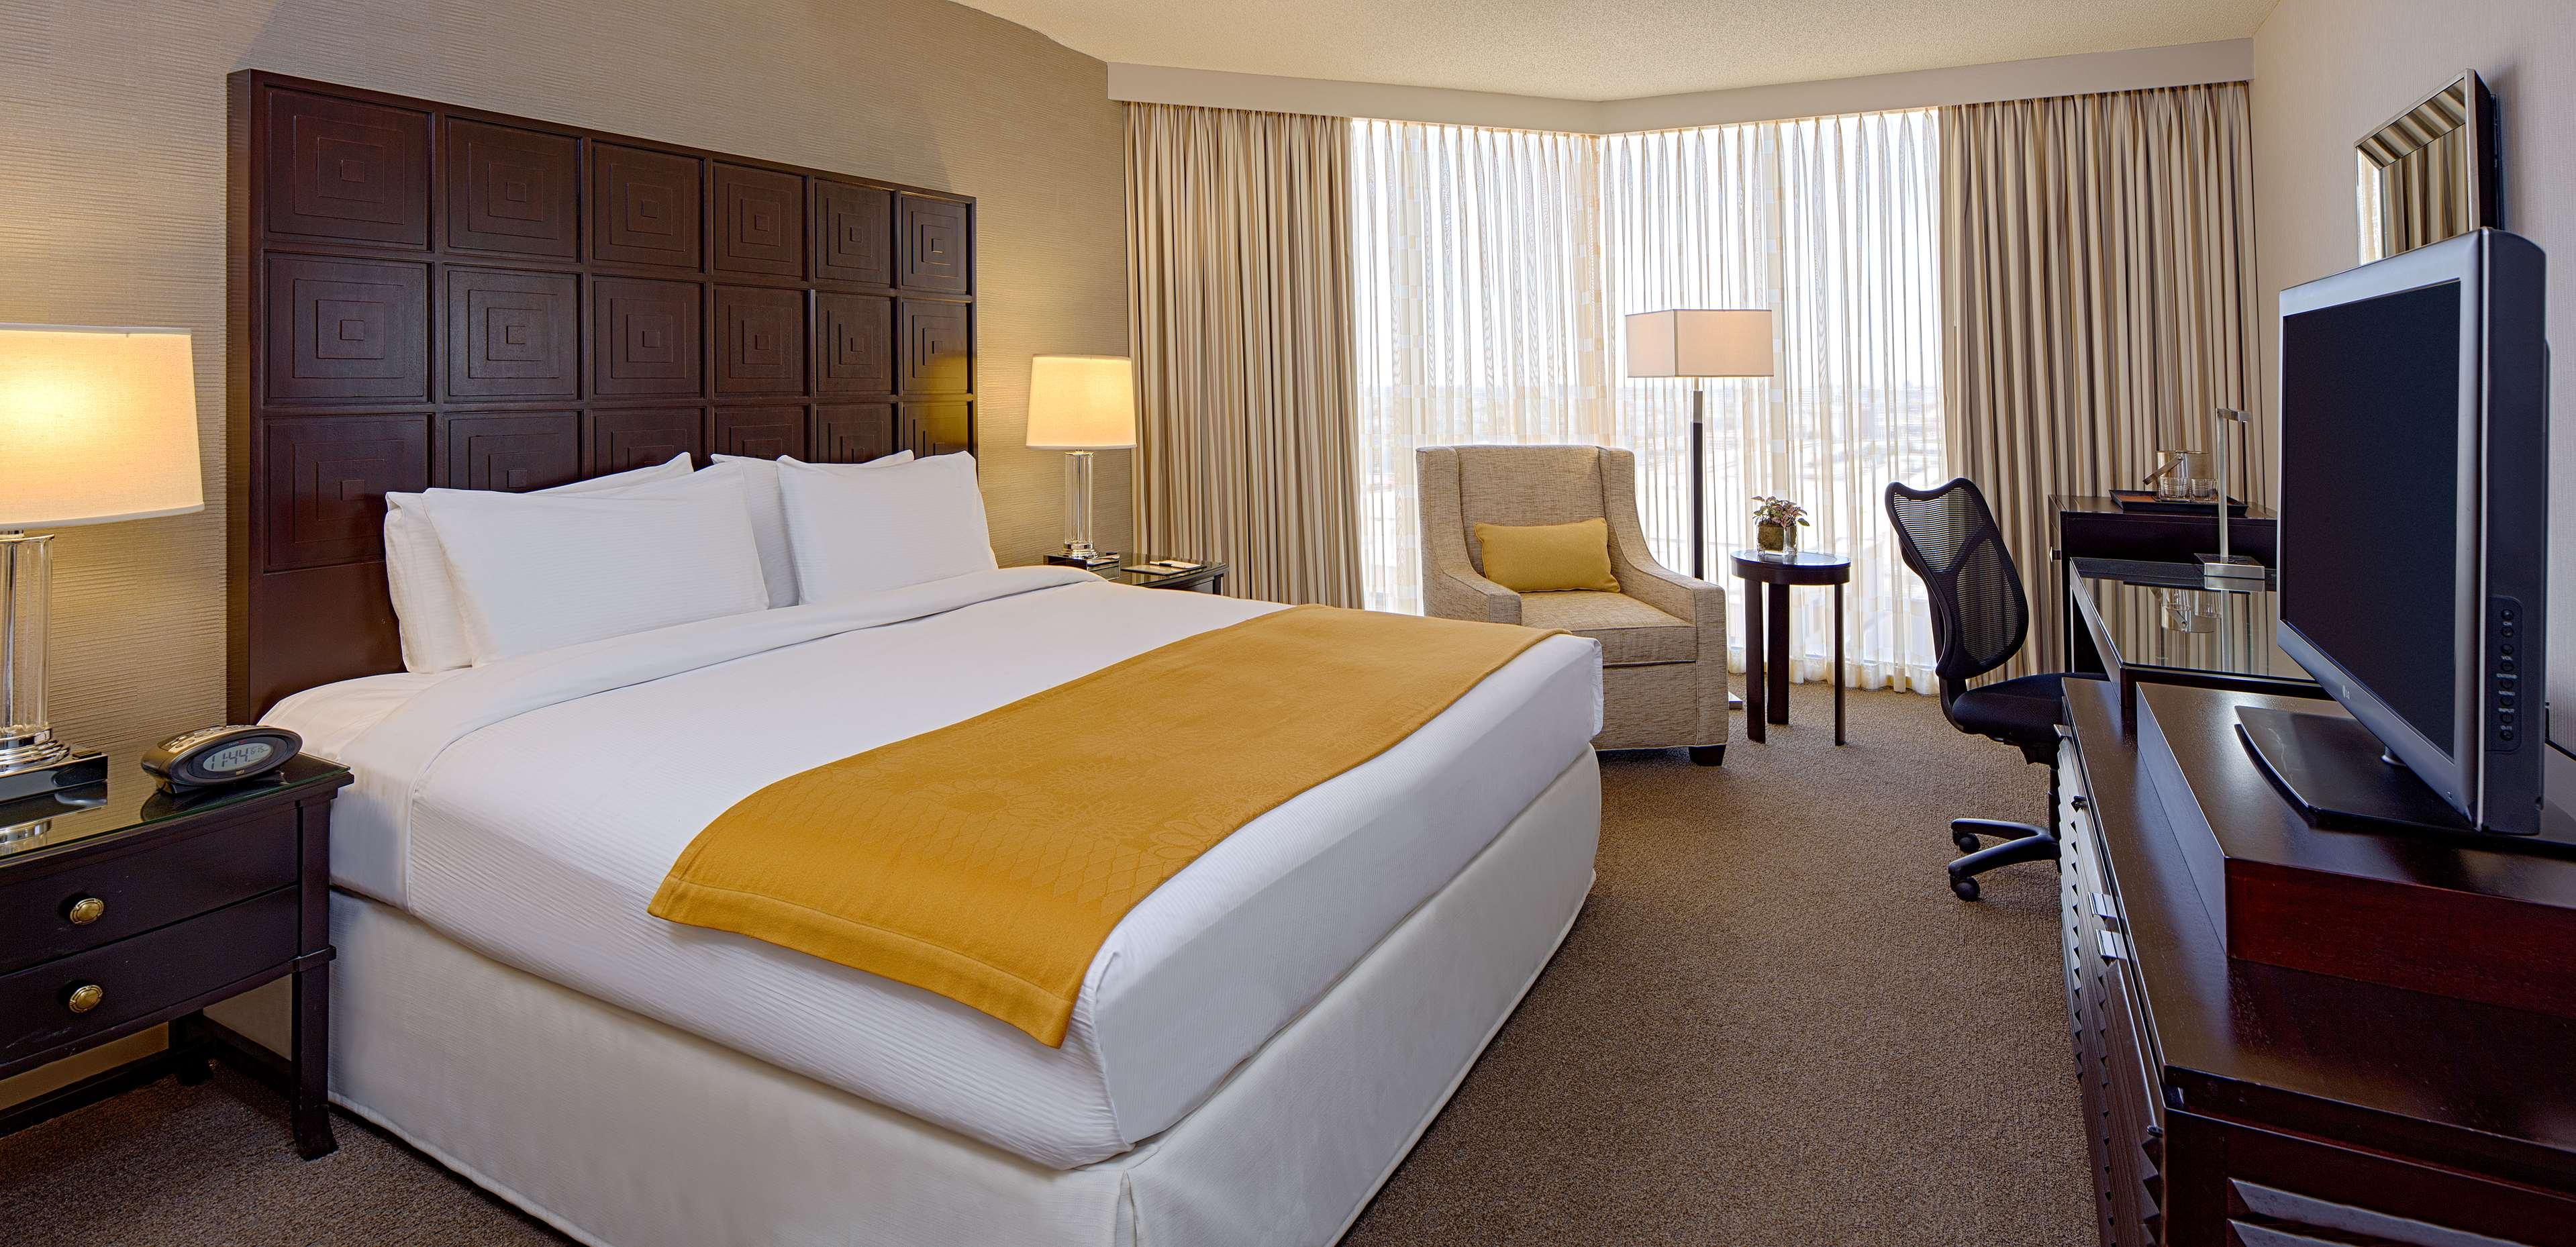 DoubleTree by Hilton Hotel Houston - Greenway Plaza image 28